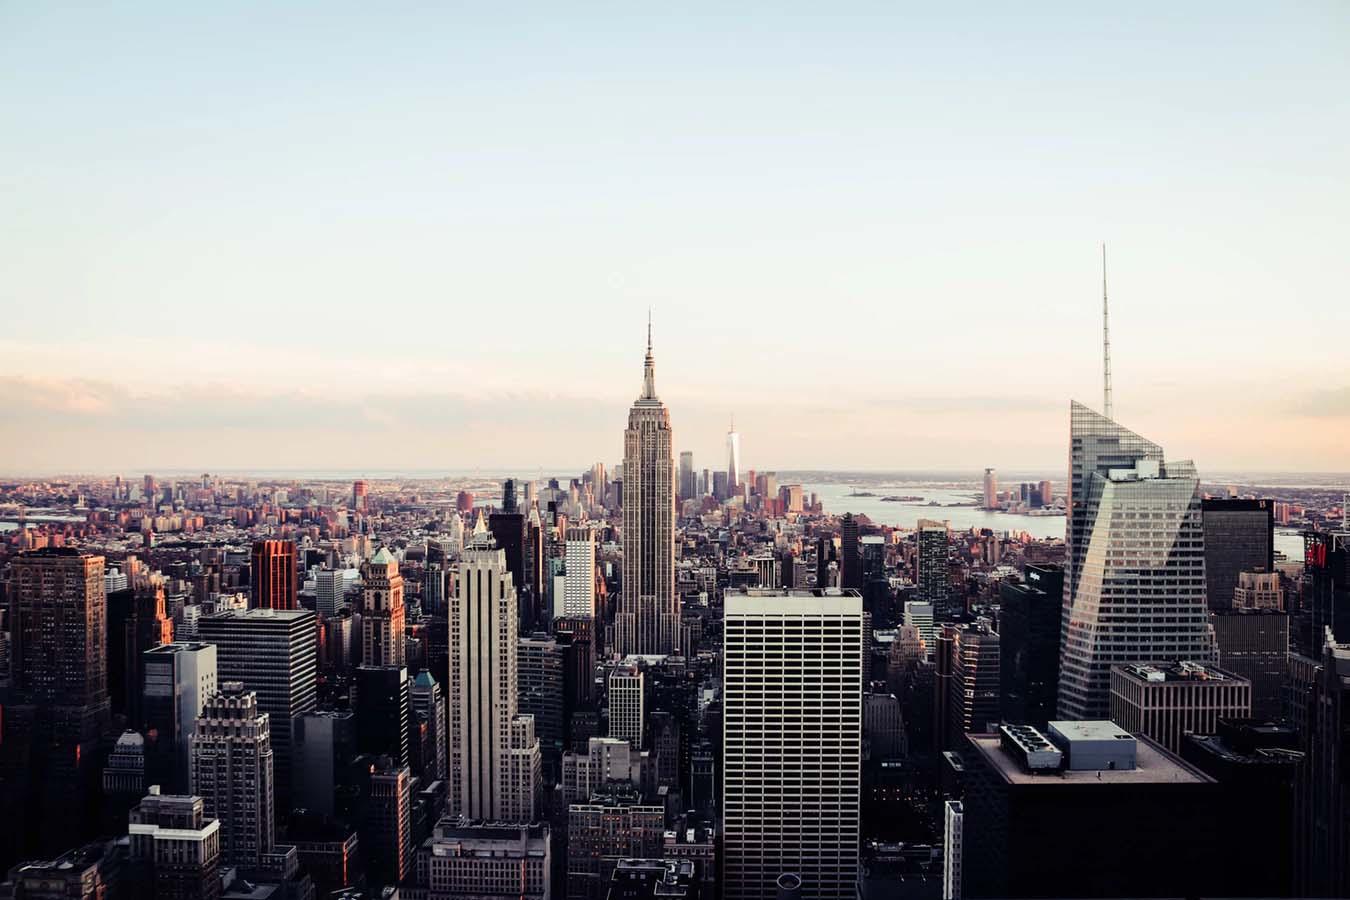 Archisoup-worlds-tallest-buildings.jpg